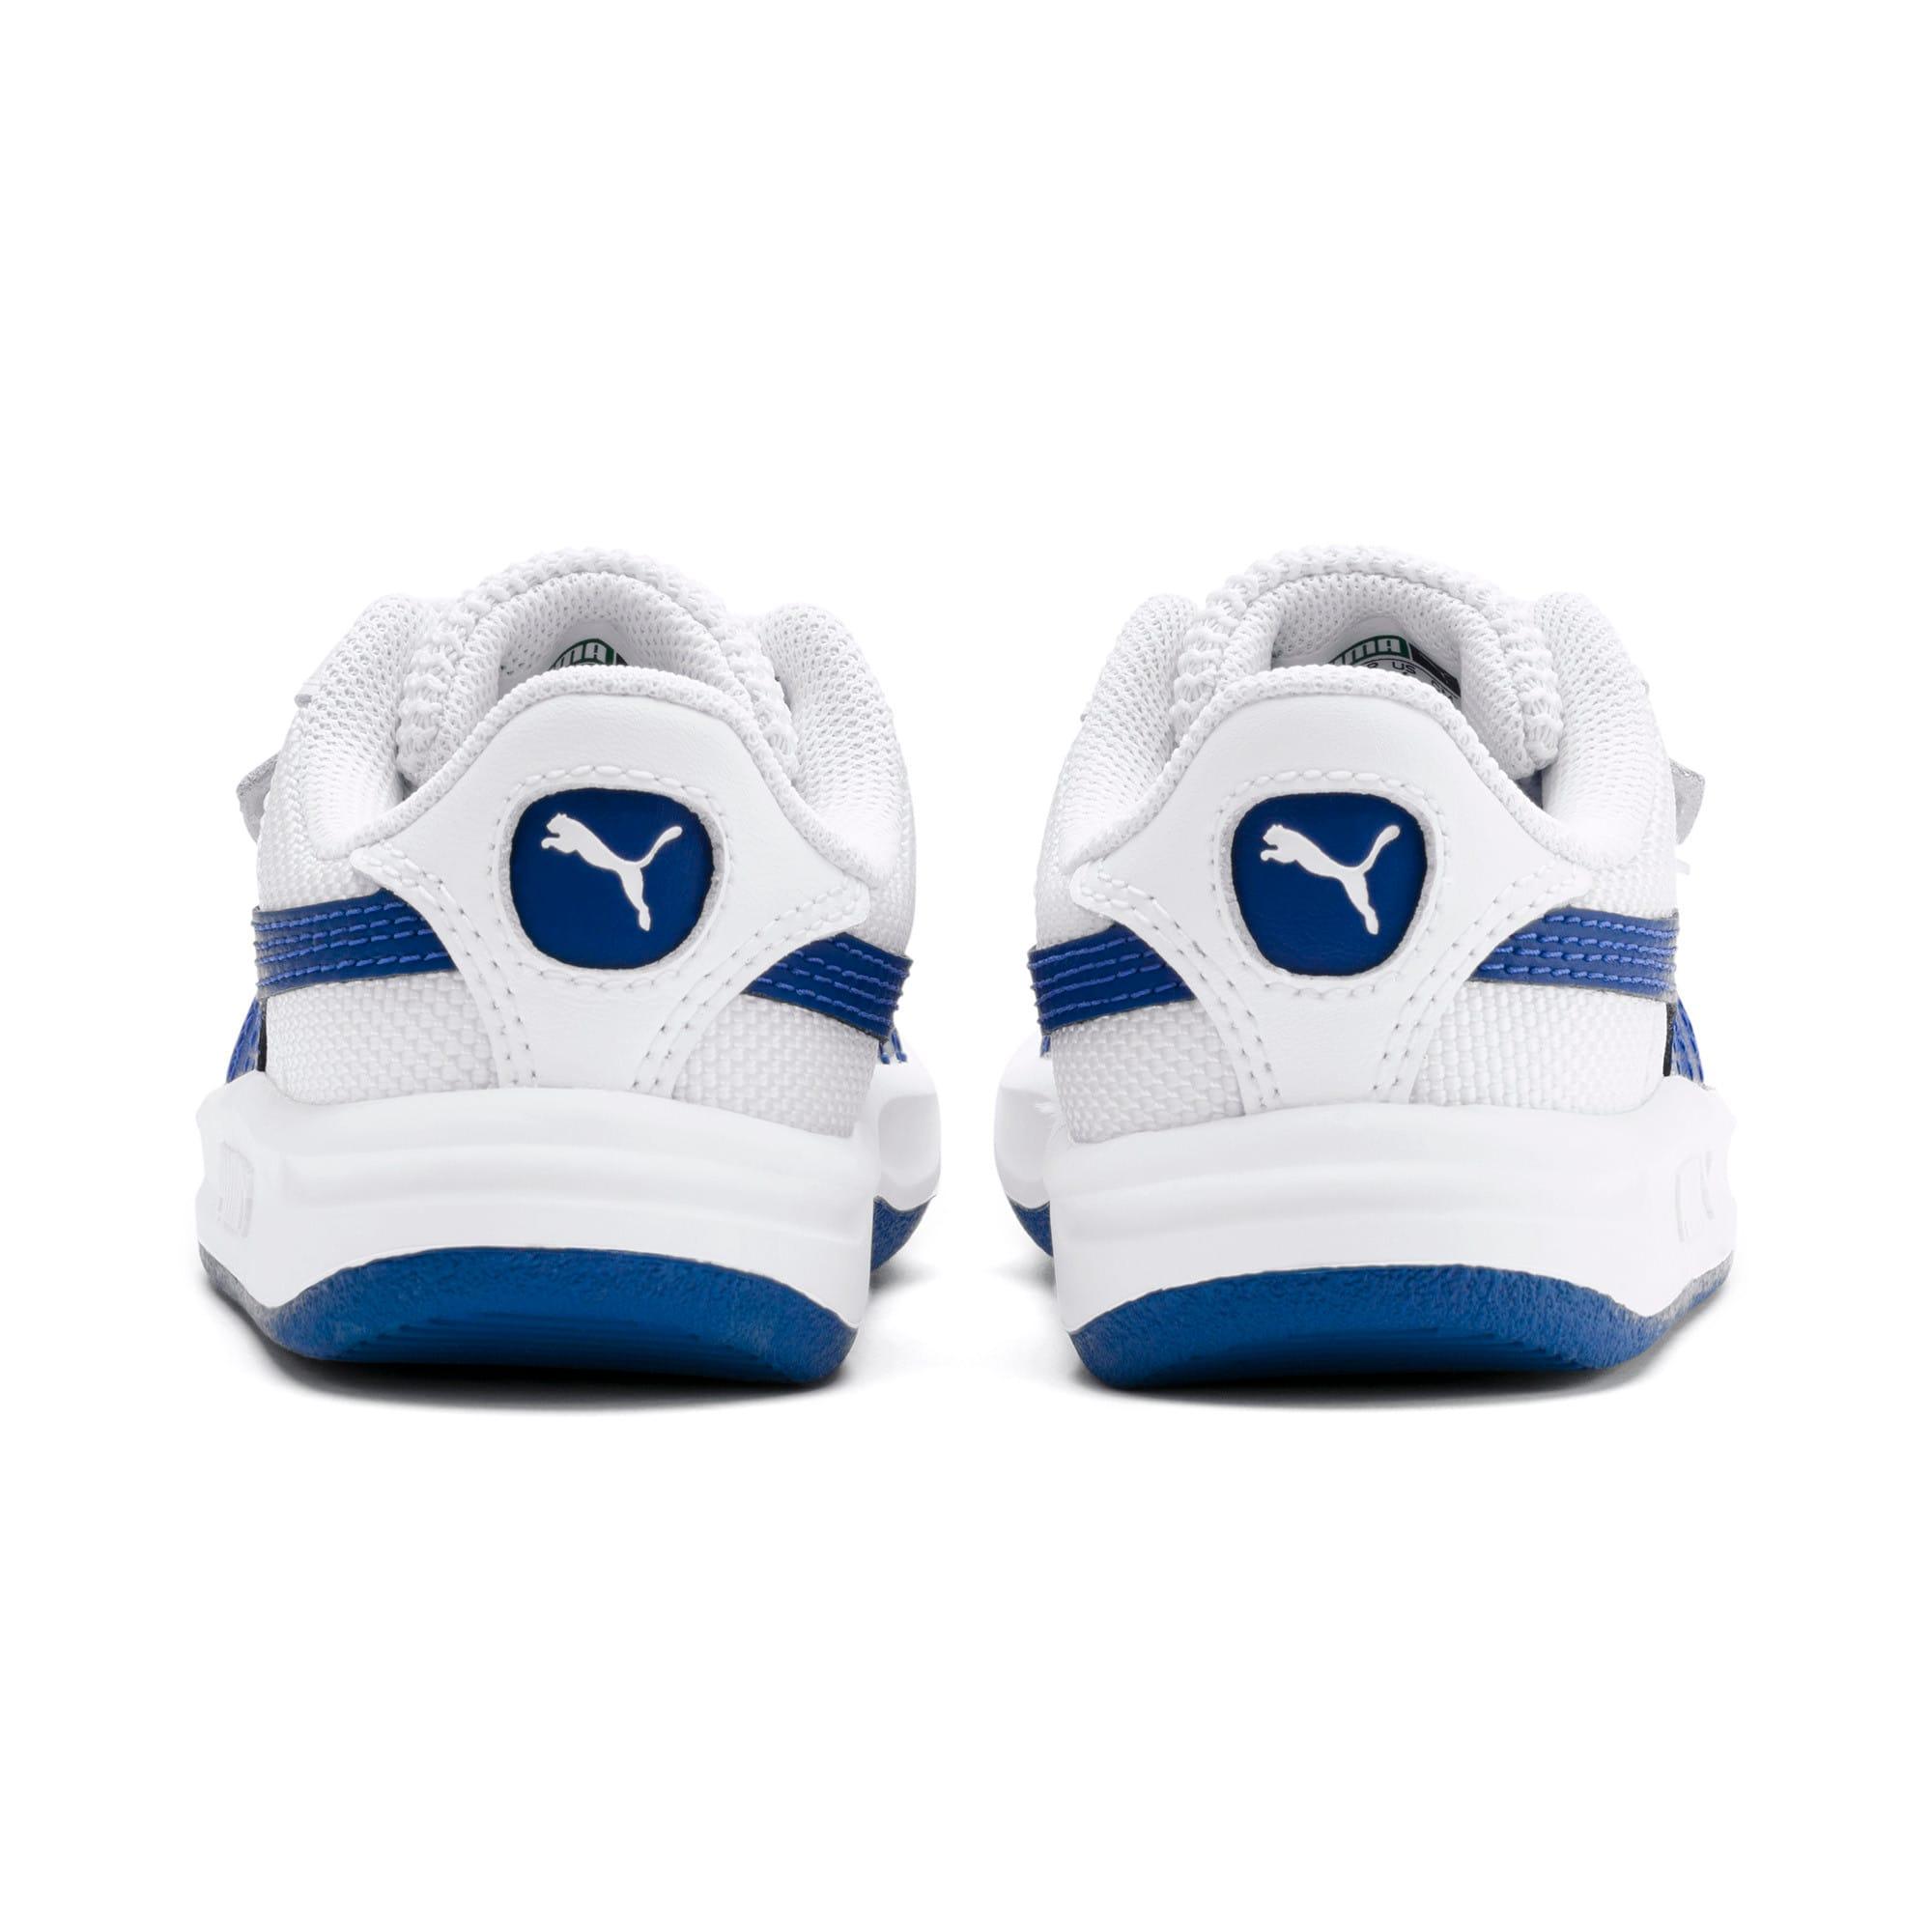 Thumbnail 3 of California Toddler Shoes, Puma White-Galaxy Blue, medium